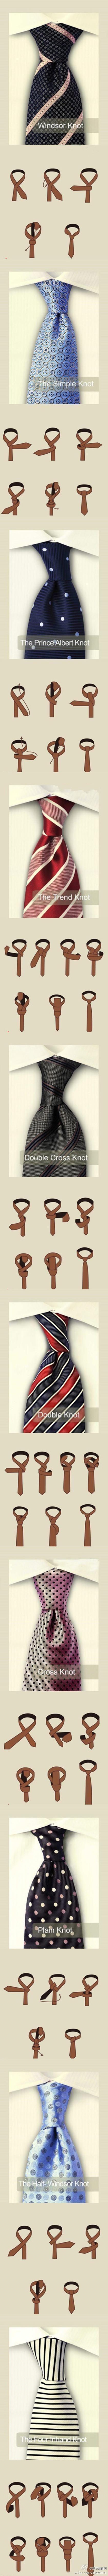 Ties... good to know